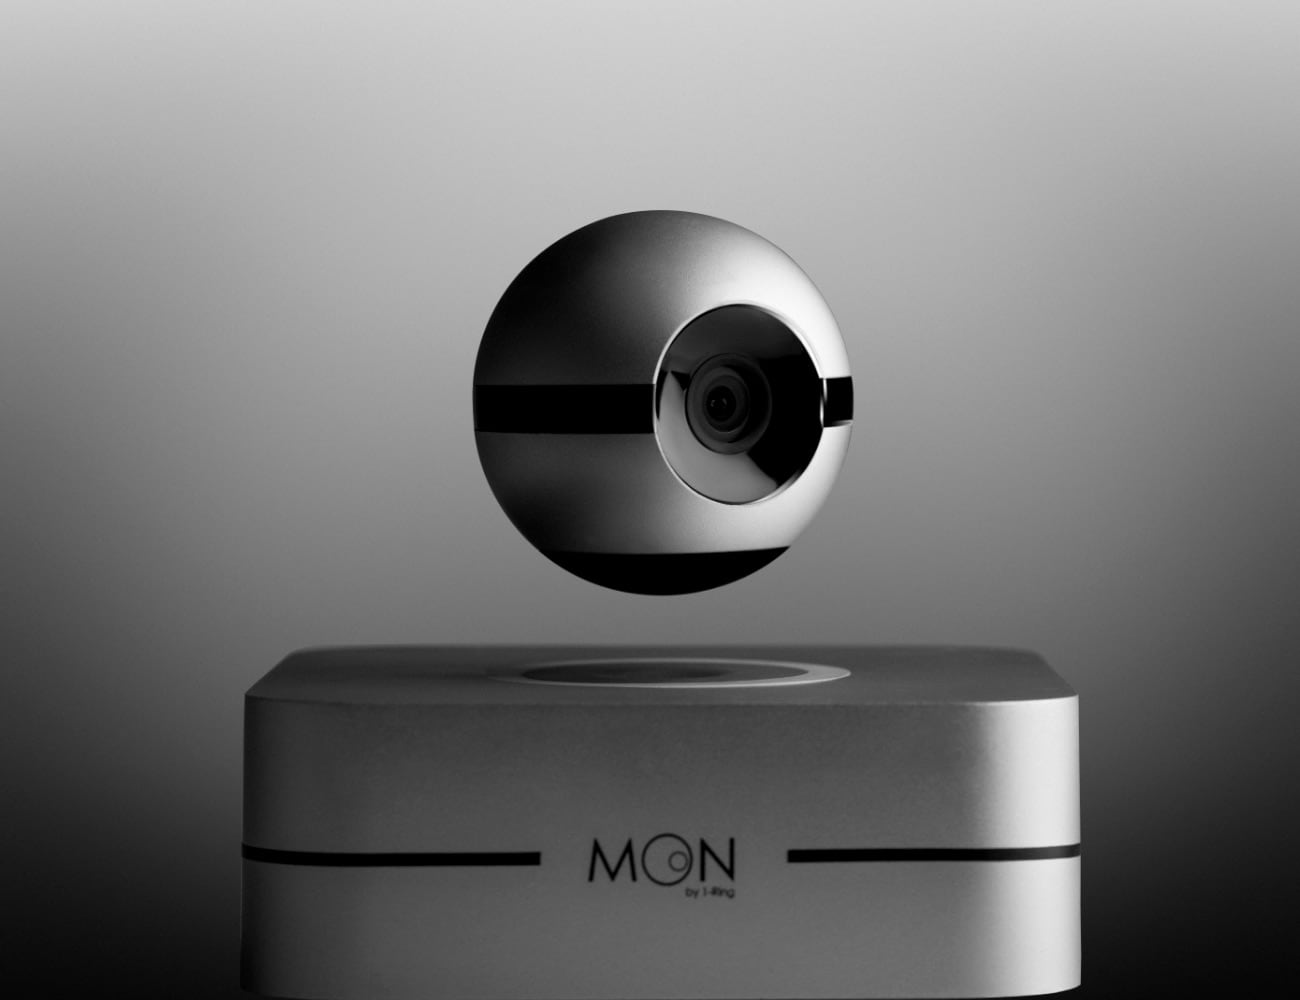 1-Ring Moon Levitating Smart Camera